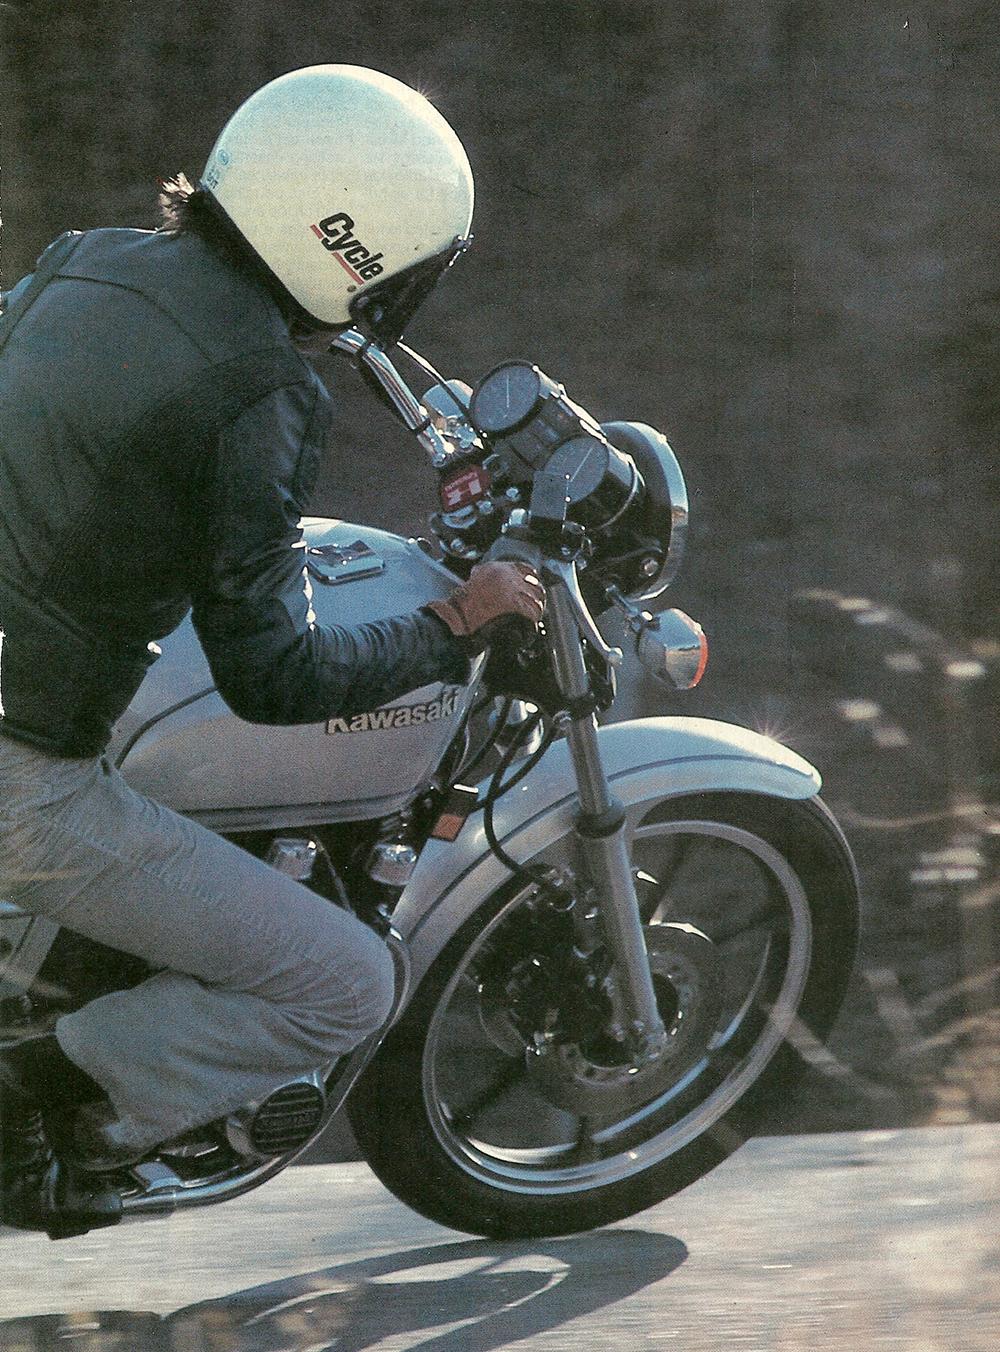 1982 Kawasaki kz750 road test 02.JPG